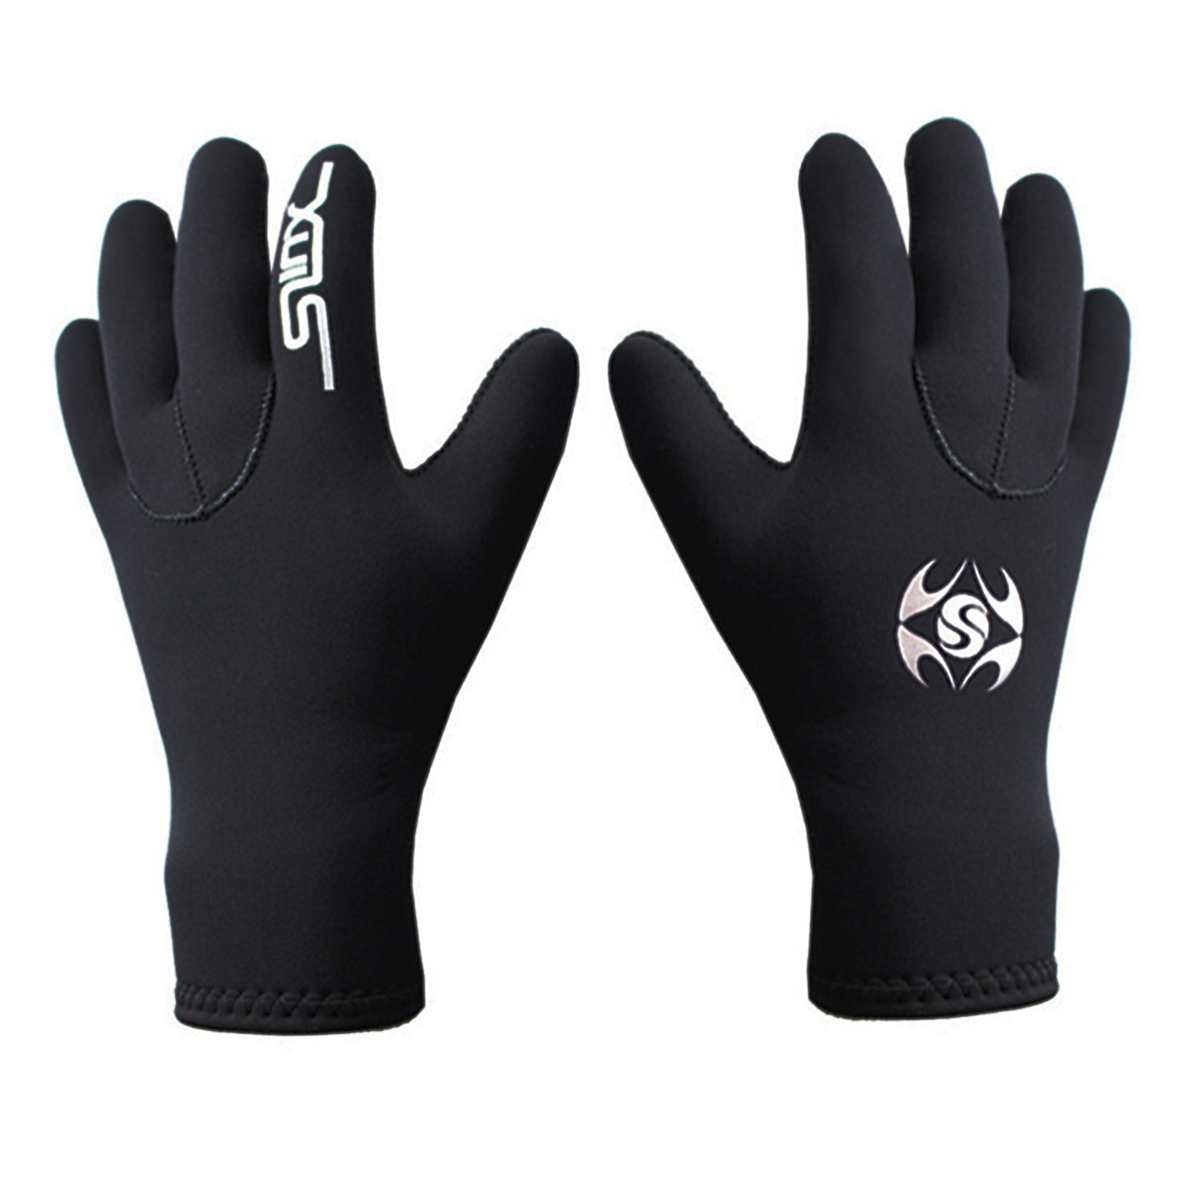 3MM Neoprene Cold-proof Winter Swim Swimming Scuba Snorkeling Diving Gloves